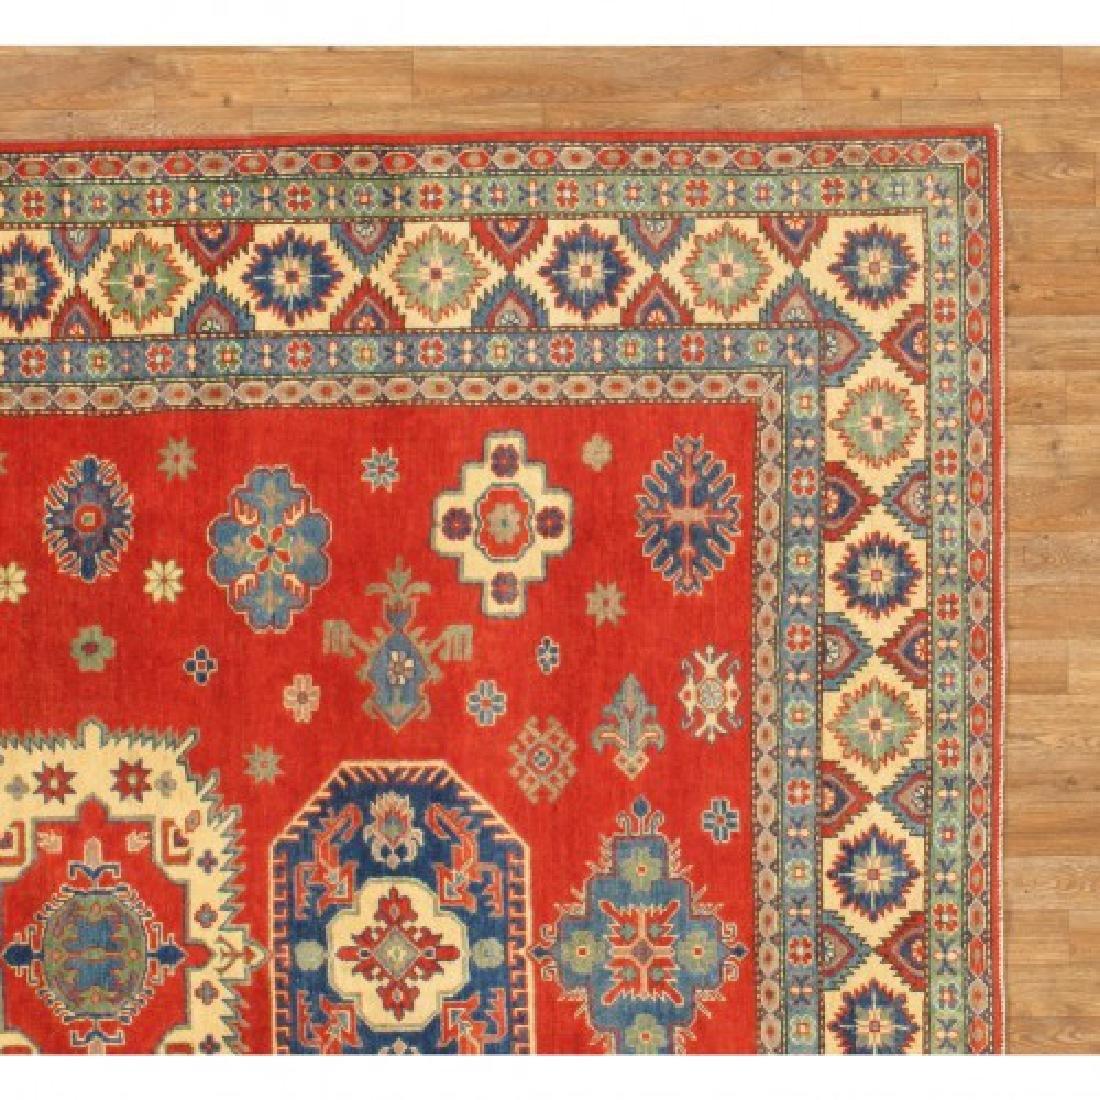 Hand Knotted Wool Kazak Rug 9x10 - 8